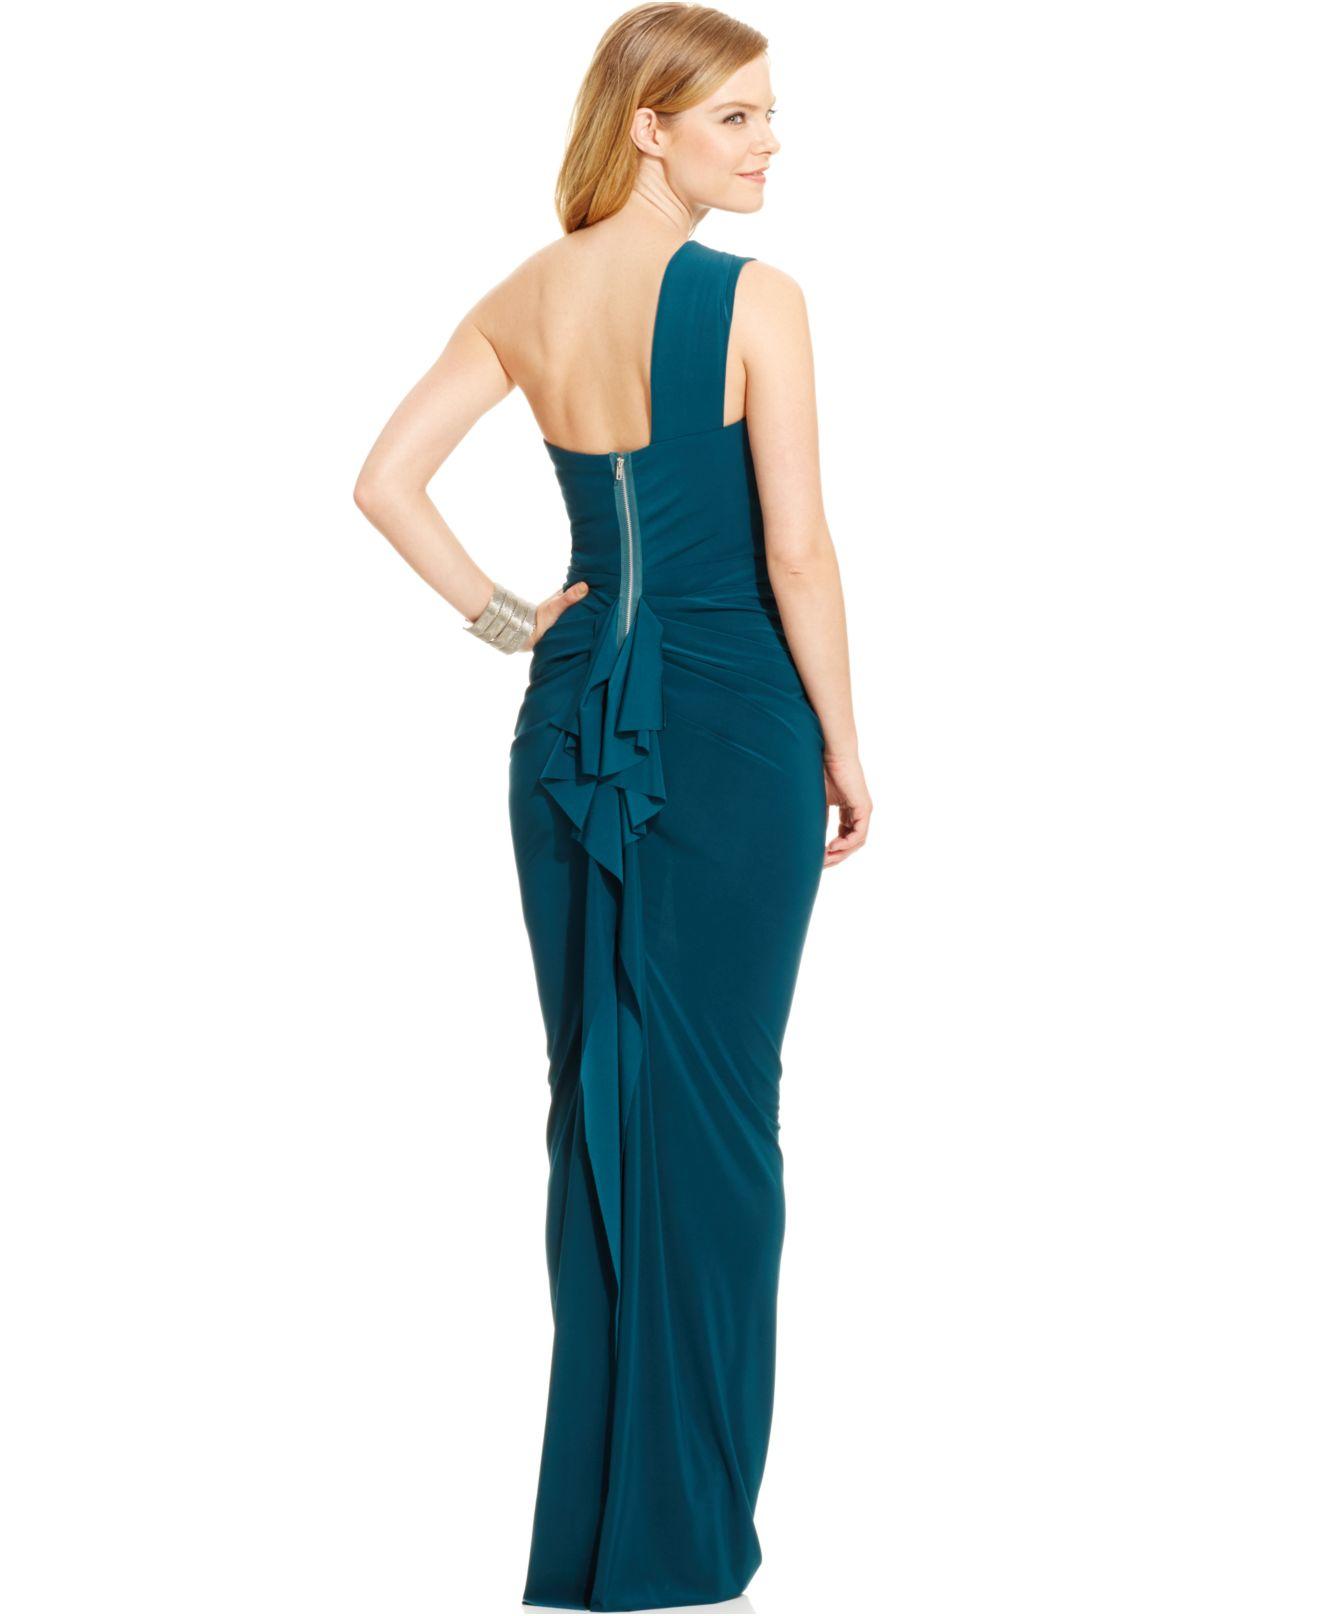 Xscape Mermaid Gown